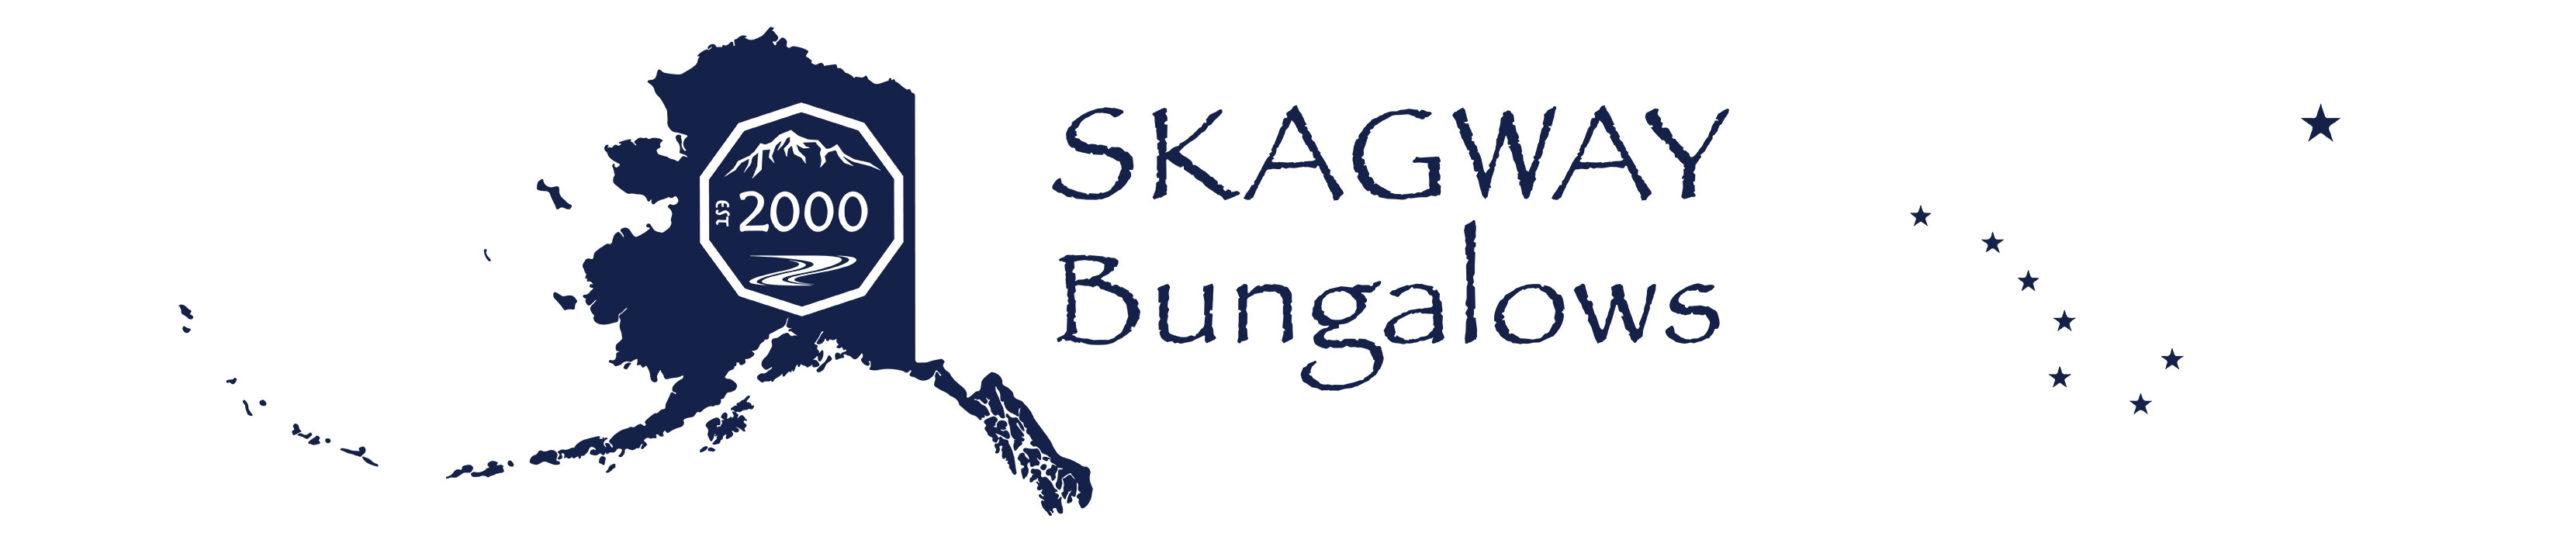 Skagway Bungalows